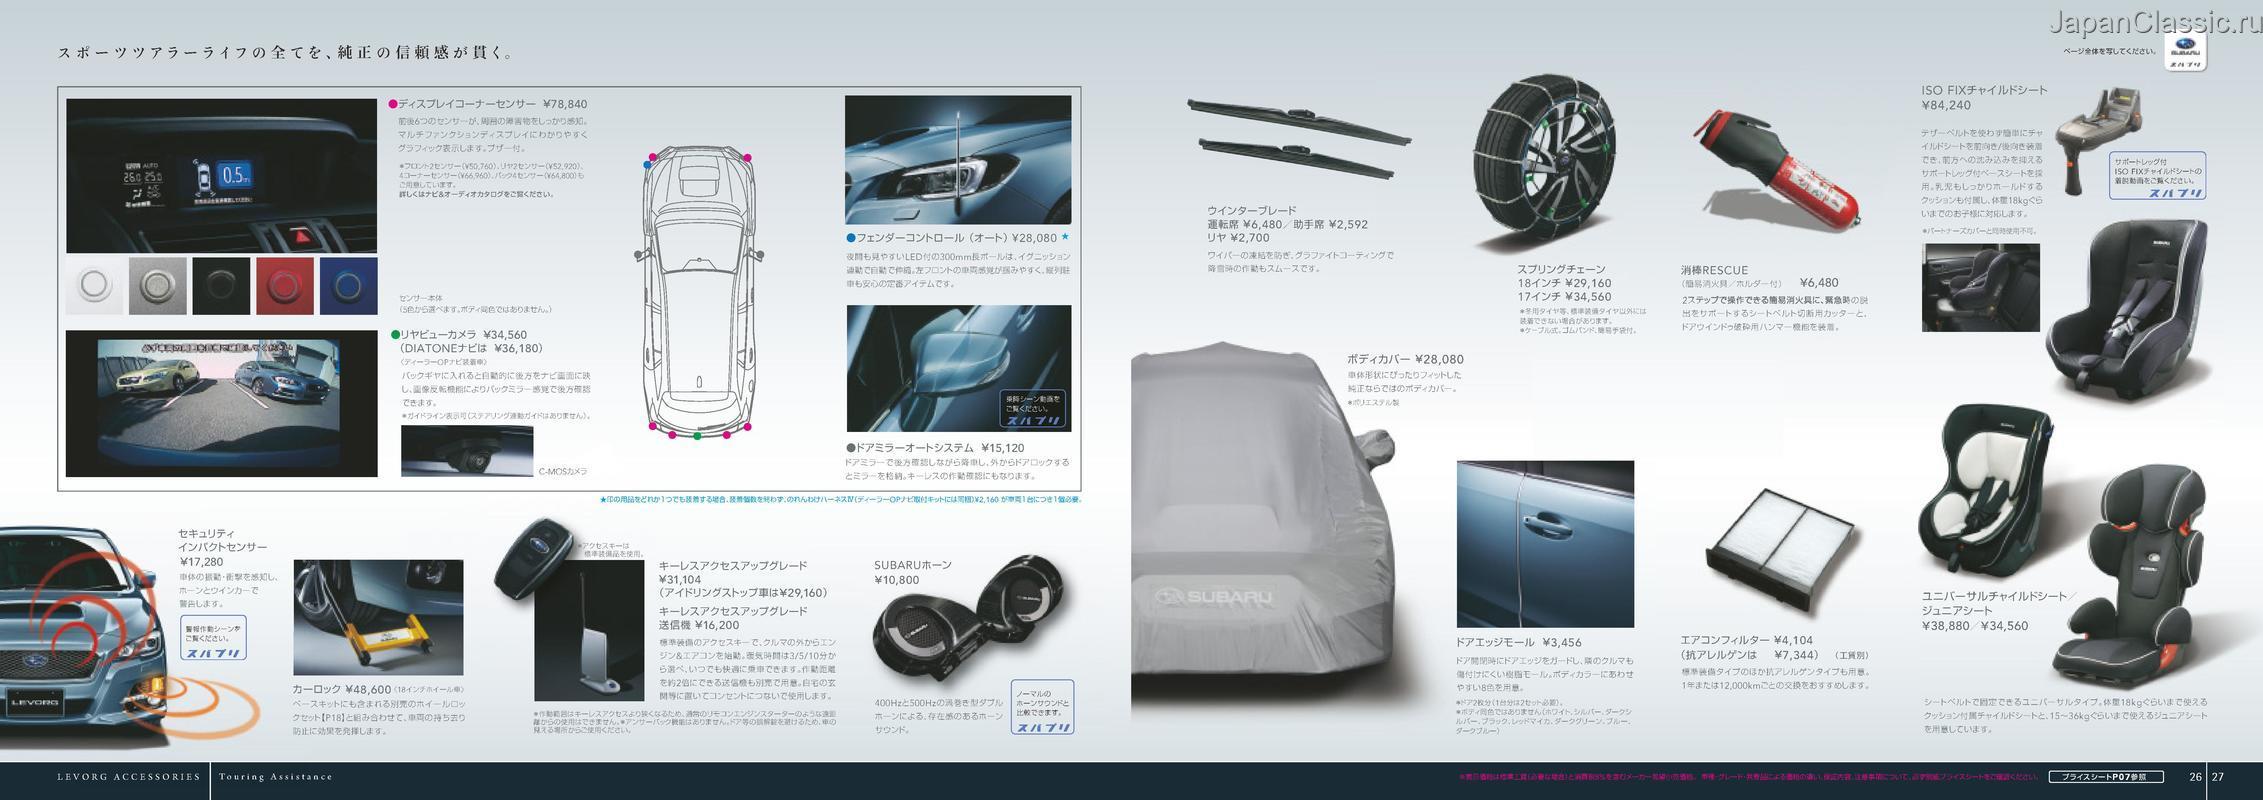 Subaru Levorg 2014 ACCESSORY VM - JapanClassic